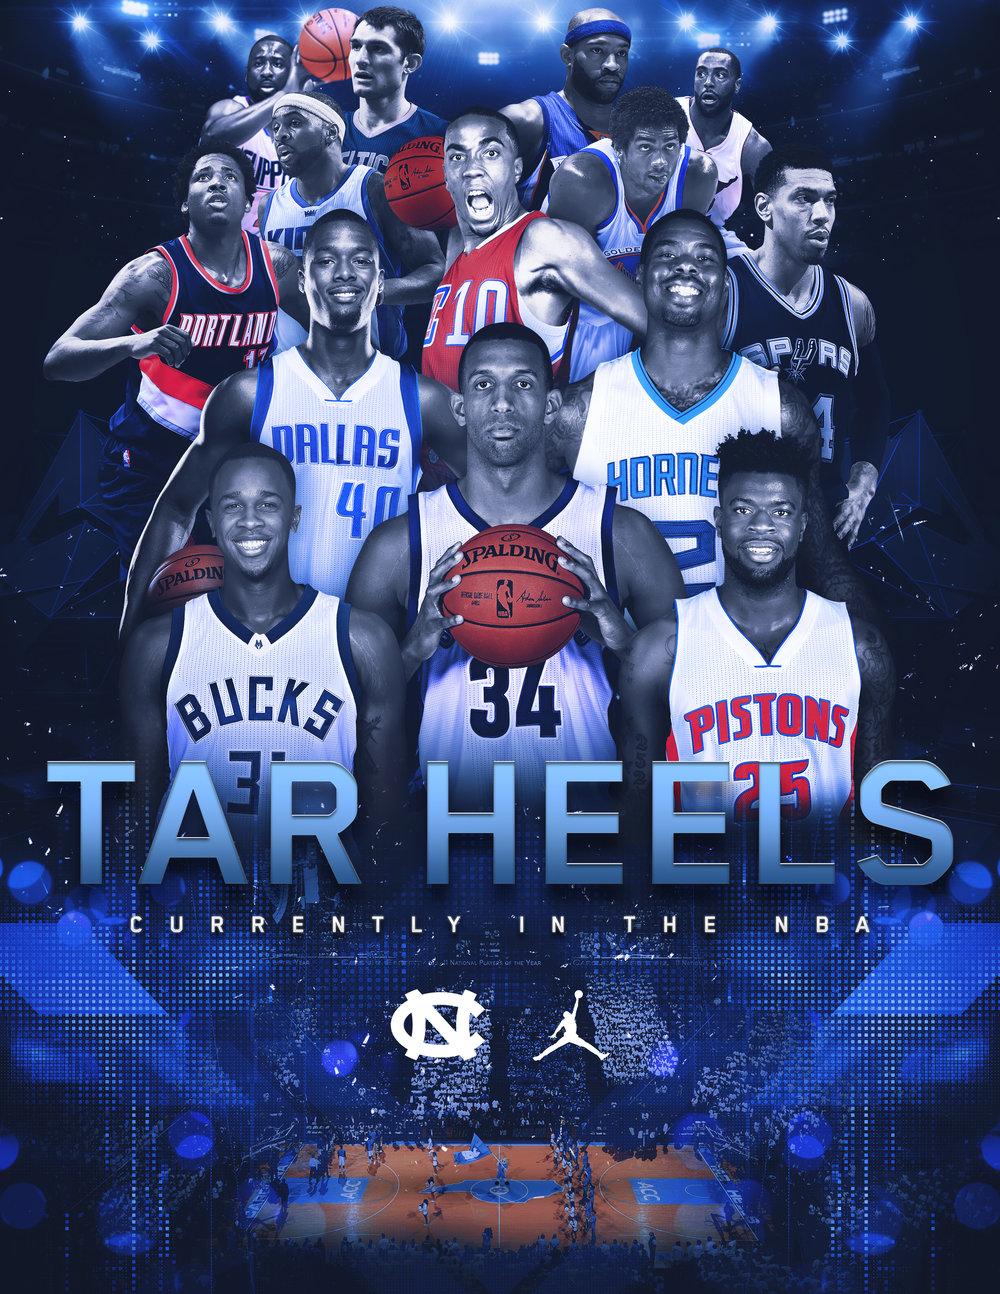 UNC Tar Heels in the NBA